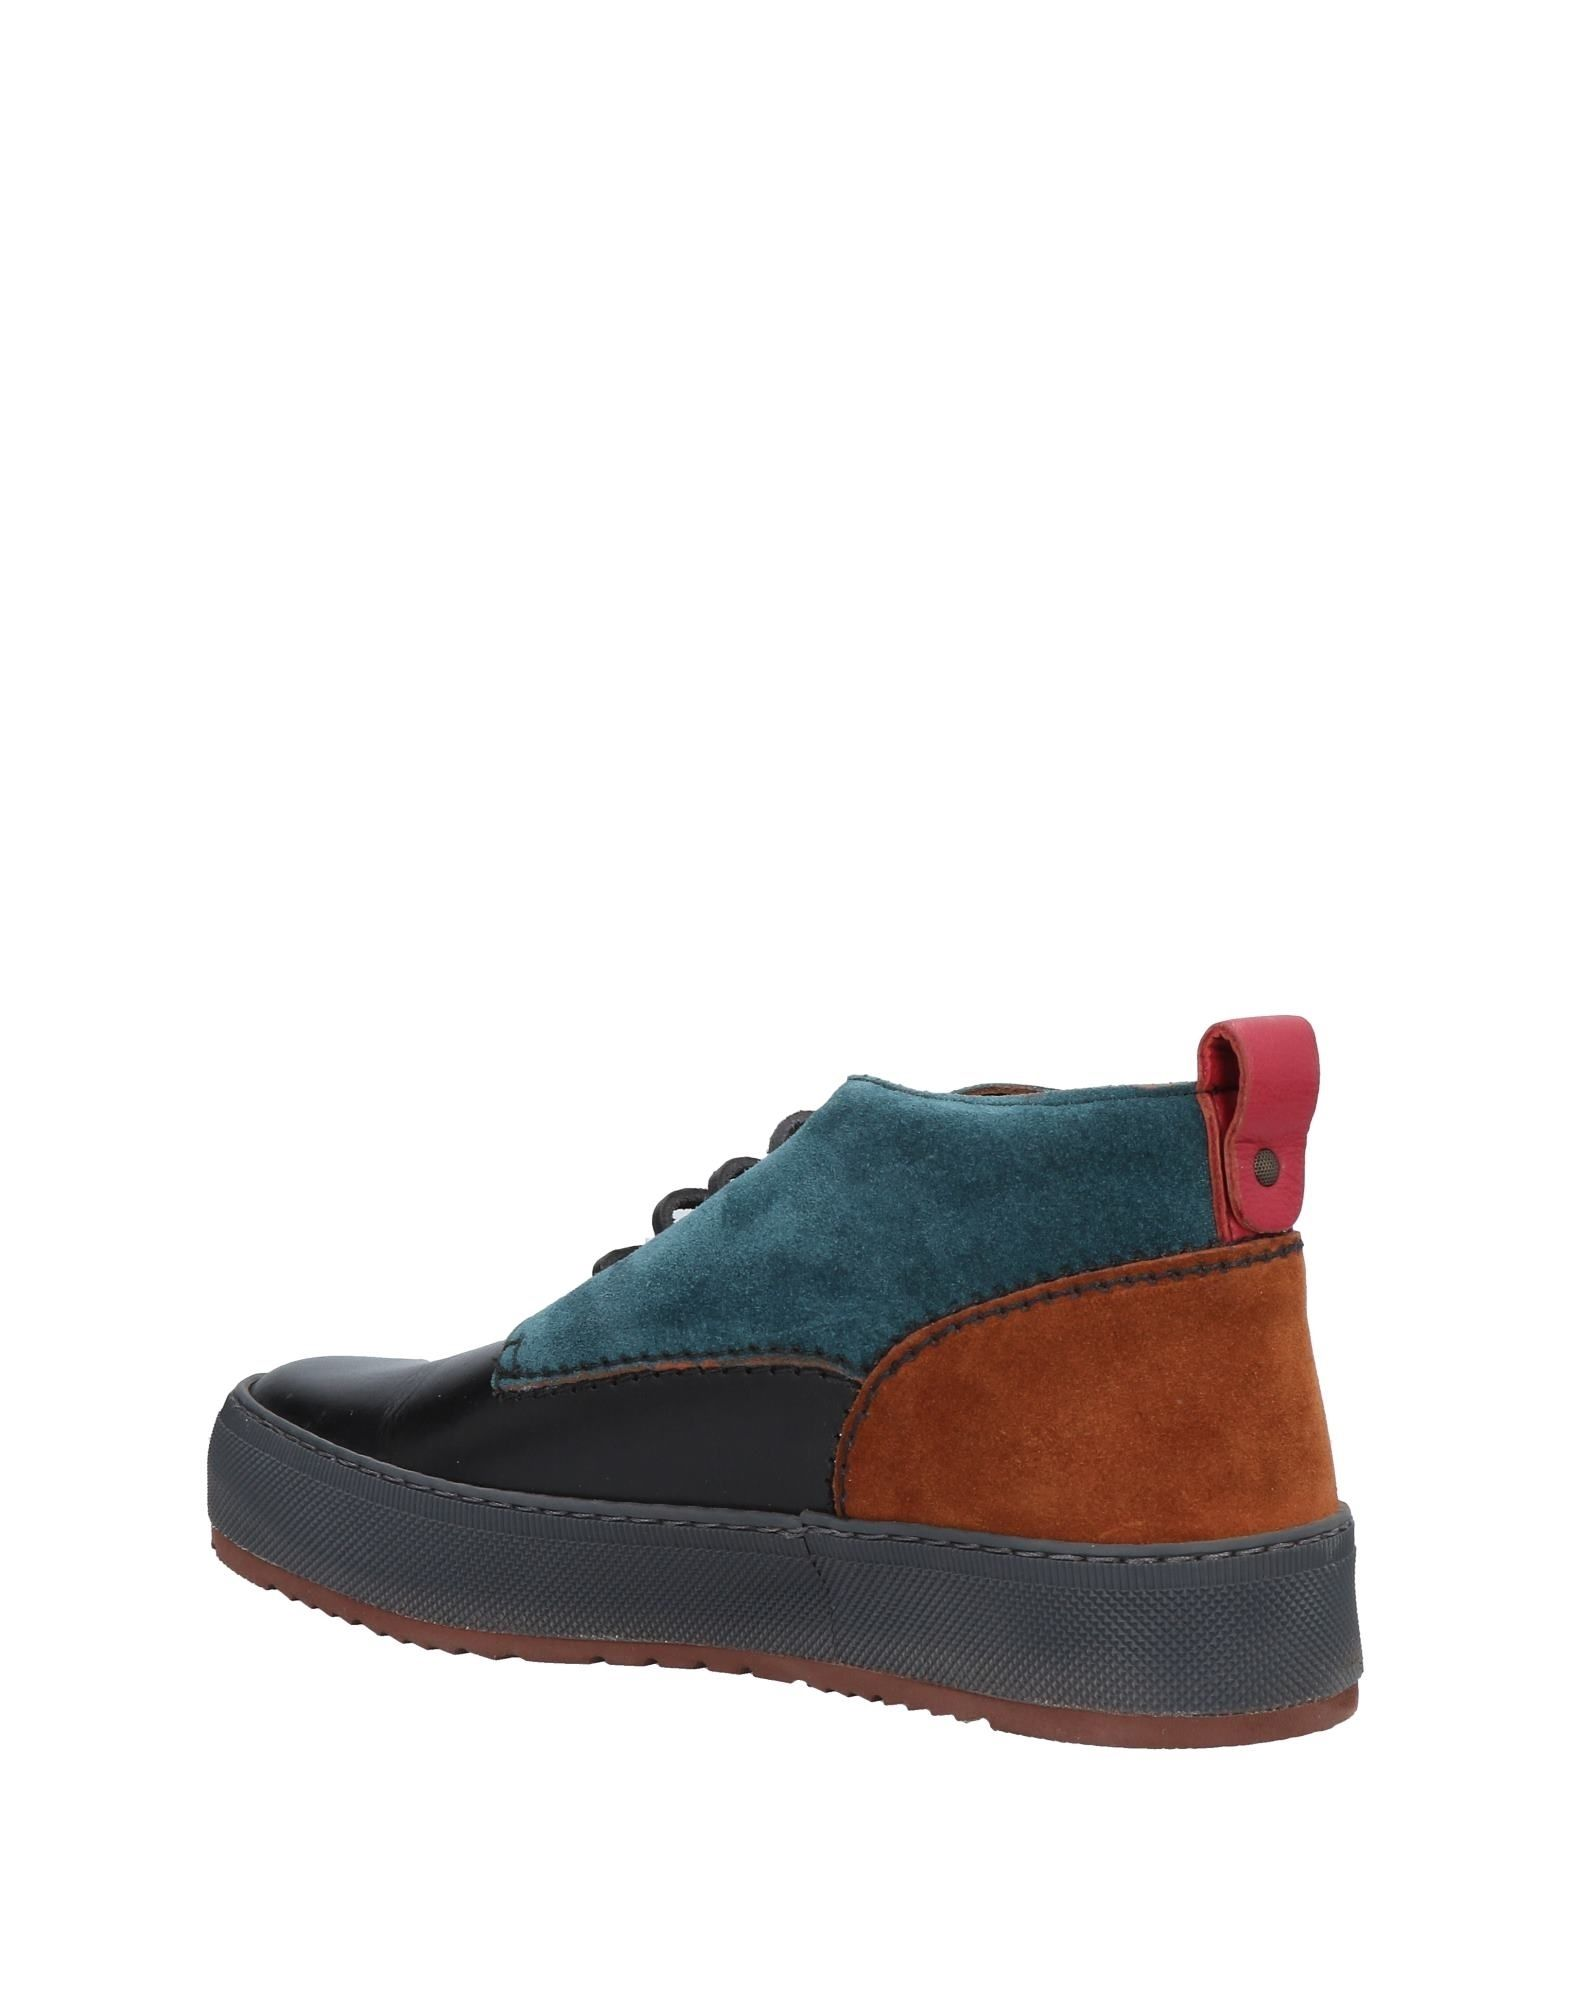 Barleycorn Barleycorn Barleycorn Sneakers - Men Barleycorn Sneakers online on  Australia - 11473084IP 75cf86